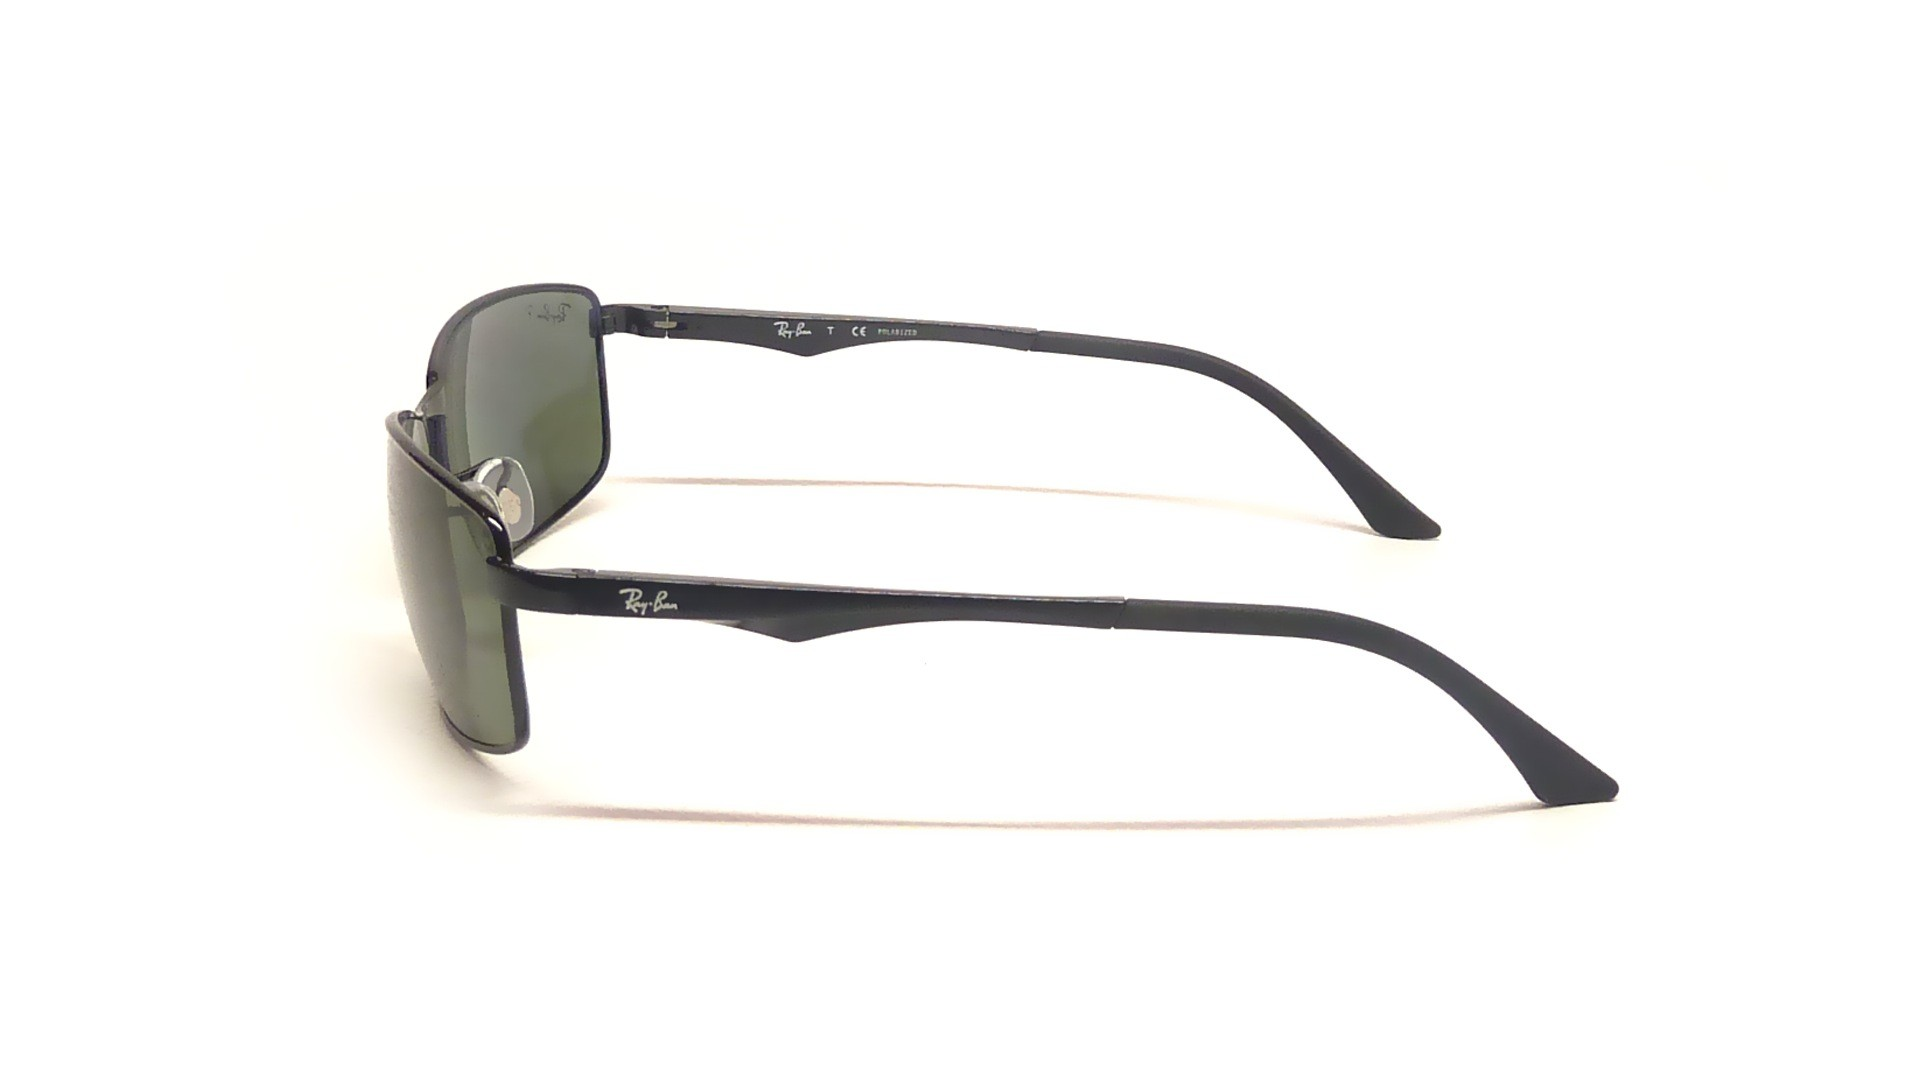 e2549b50bdfa7 Sunglasses Ray-Ban RB3498 002 9A 64-17 Black Large Polarized